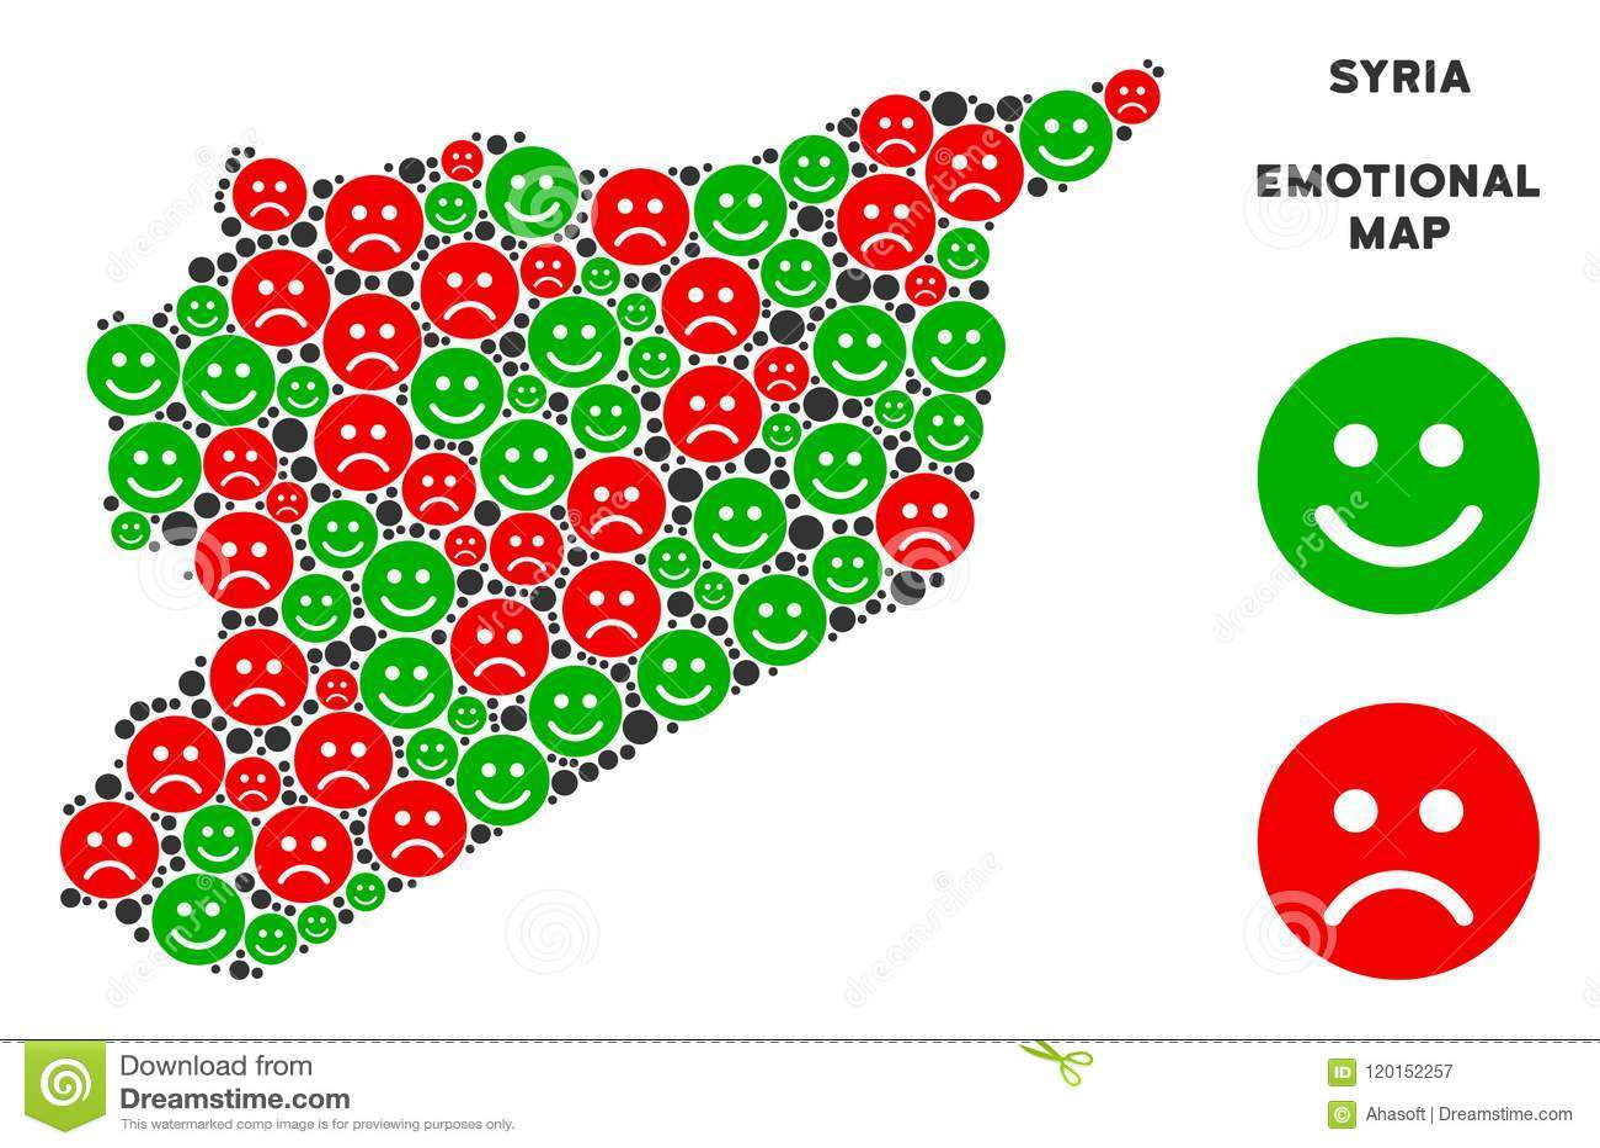 Vector Emotion Syria Map Mosaic Of Emojis